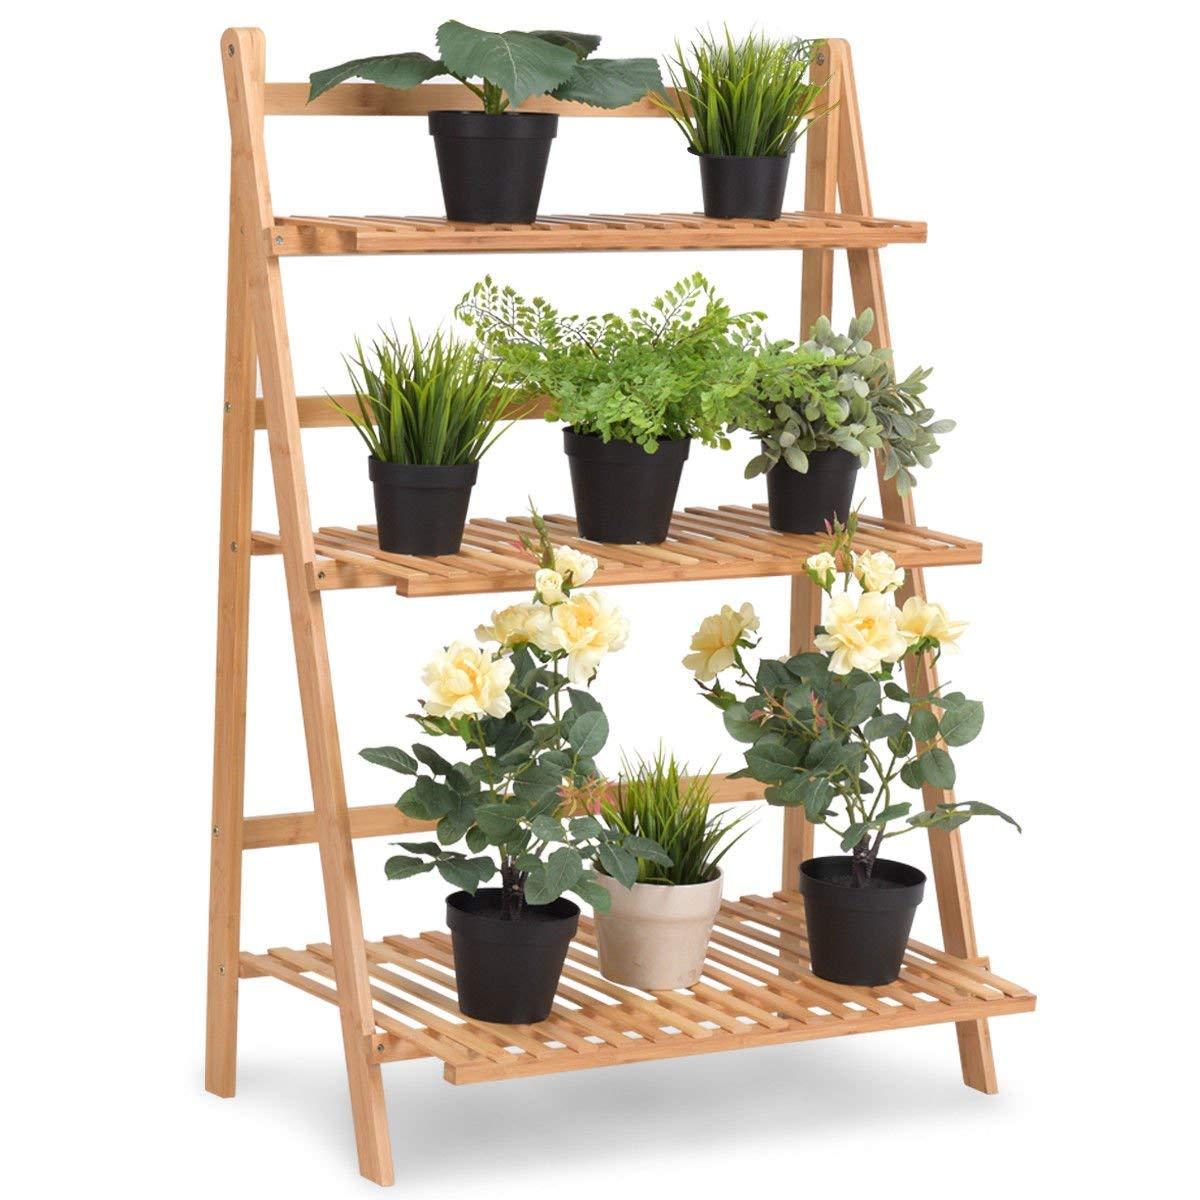 Giantex Plant Flower Stand Rack Shelf 3-Tier Bamboo Foldable Pot Racks Planter Organizer Display Shelves, 27.6'' x15.7'' x 38.2'' (Natural) by Giantex